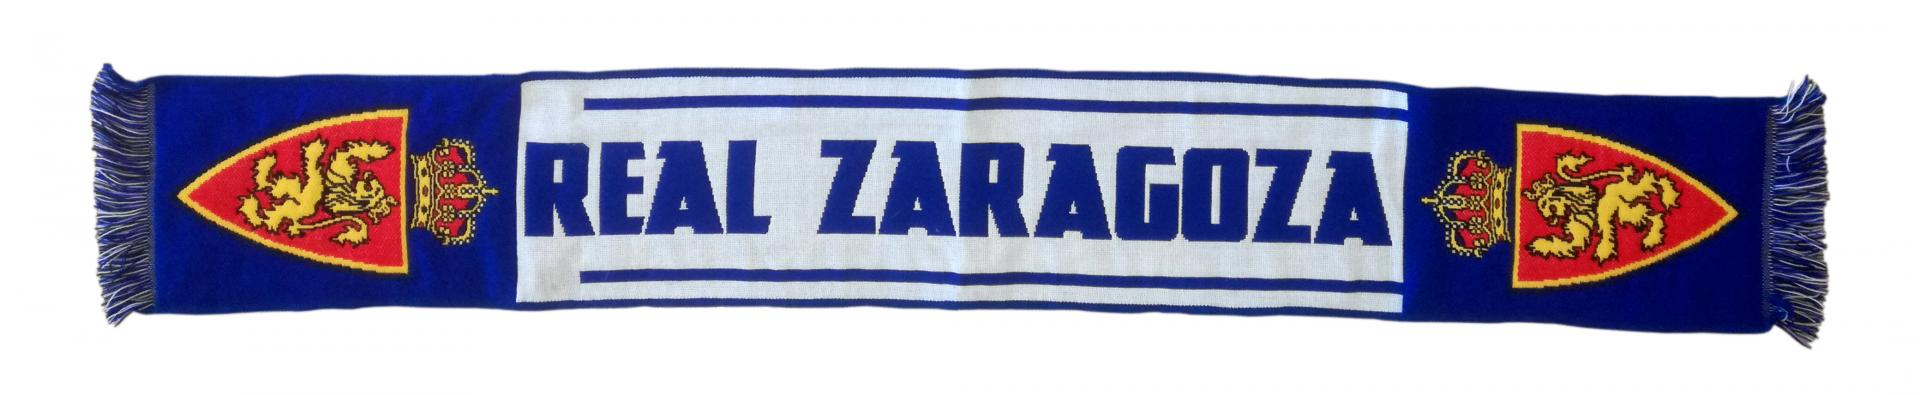 Bufanda Real Zaragoza